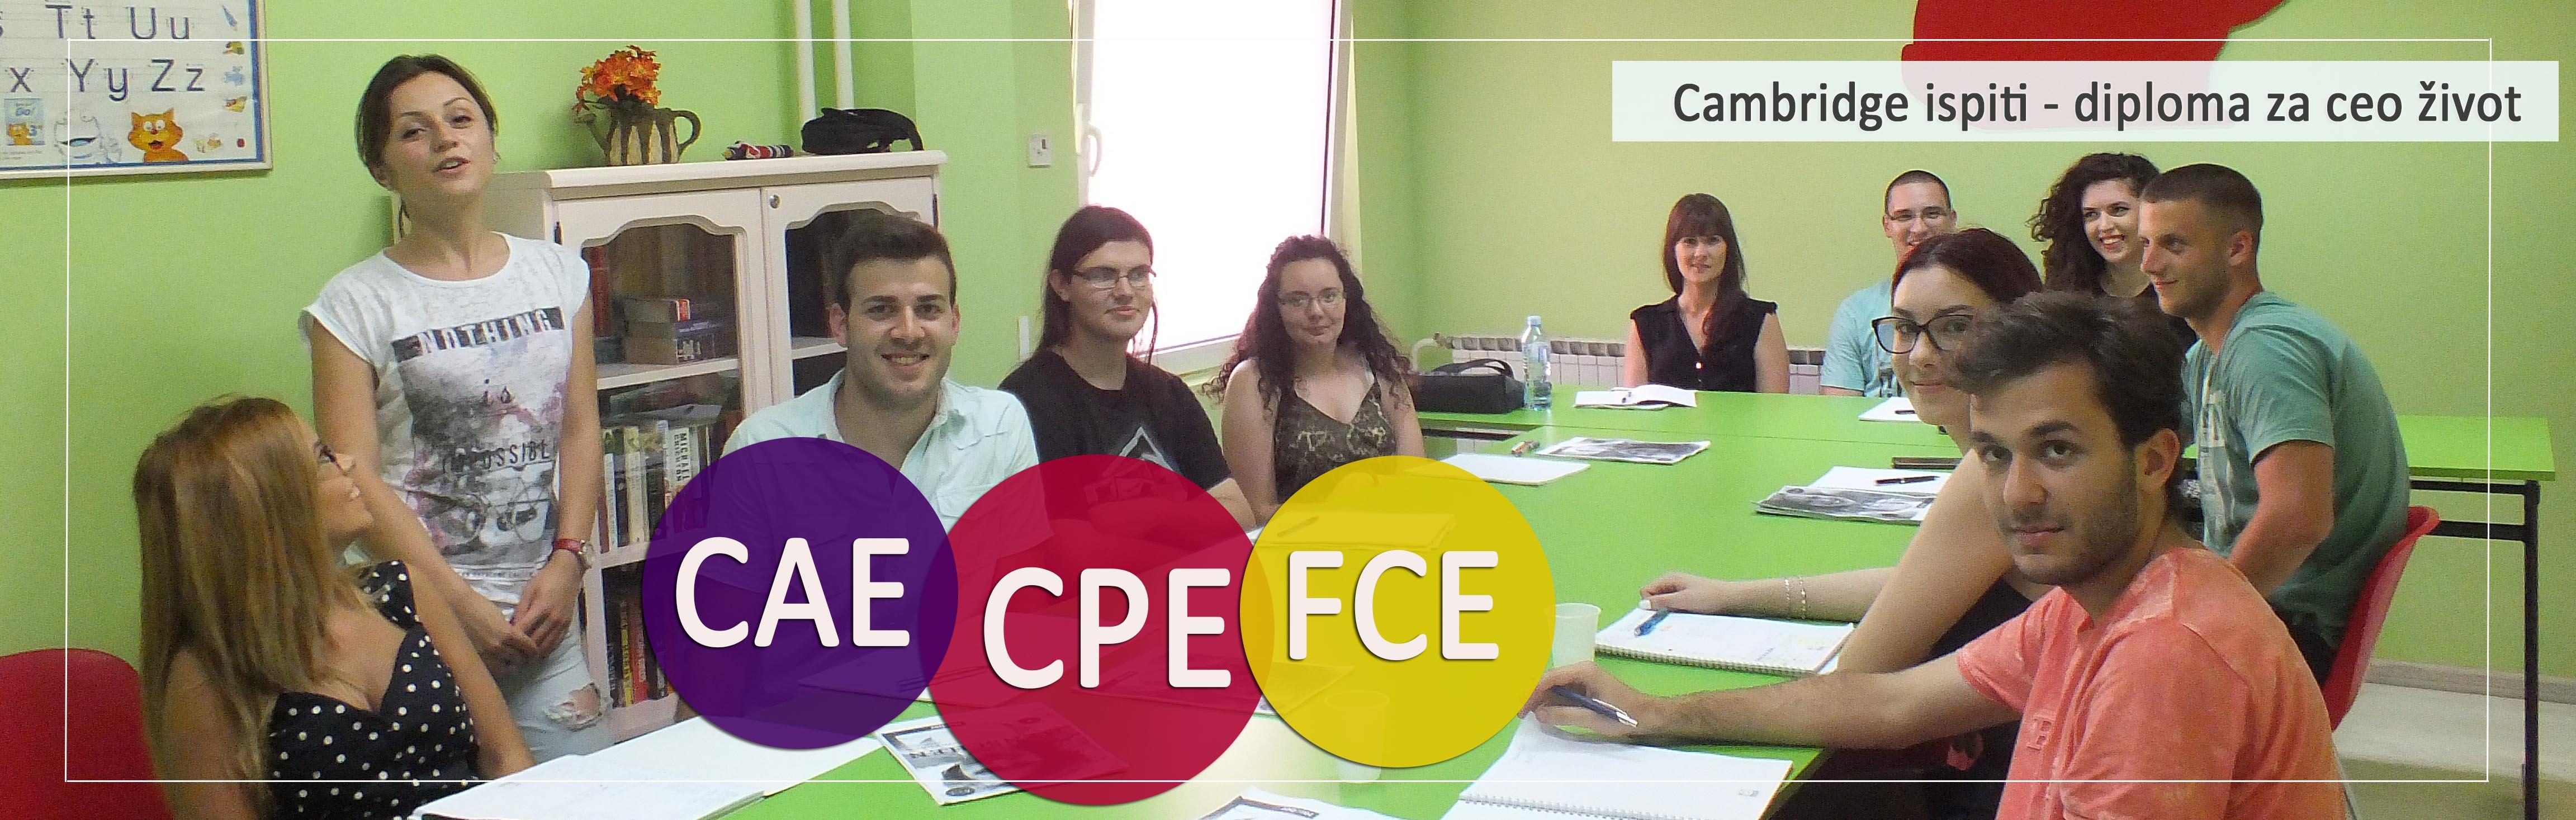 Cambridge English Exams - pripremni kursevi u Academiji | ACADEMIA